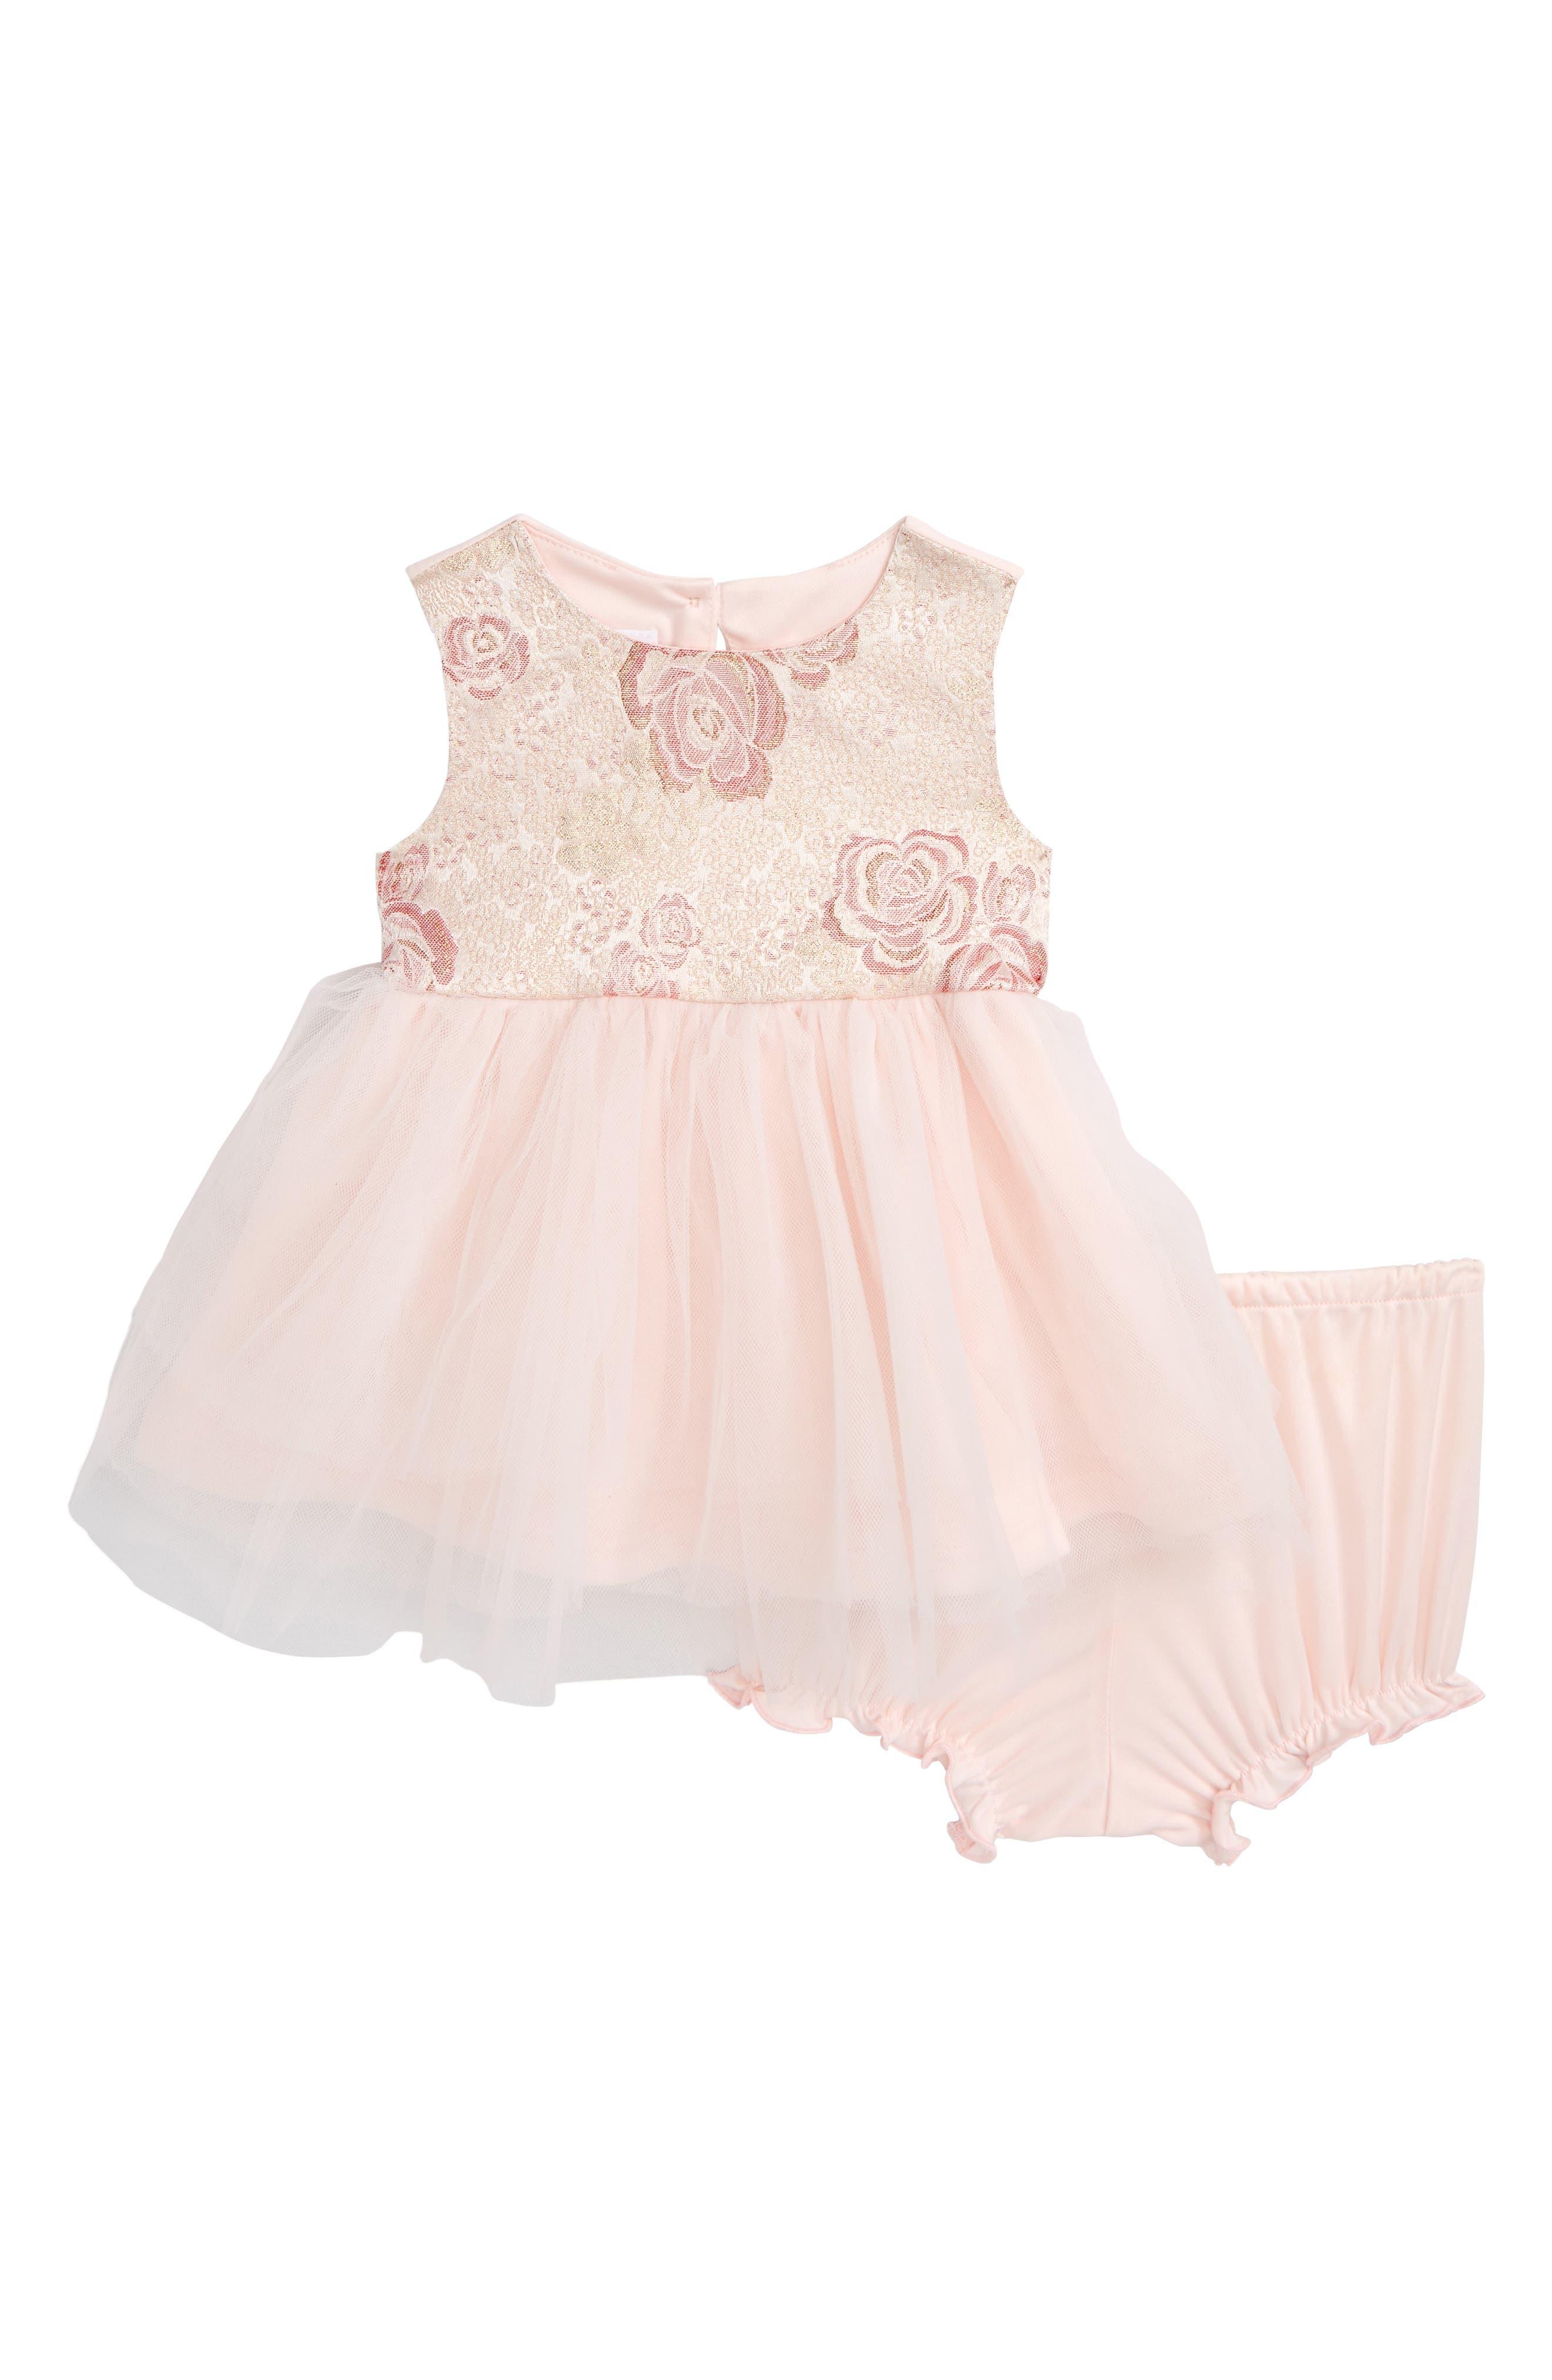 Jacquard Ballerina Party Dress,                             Main thumbnail 1, color,                             Light Pink